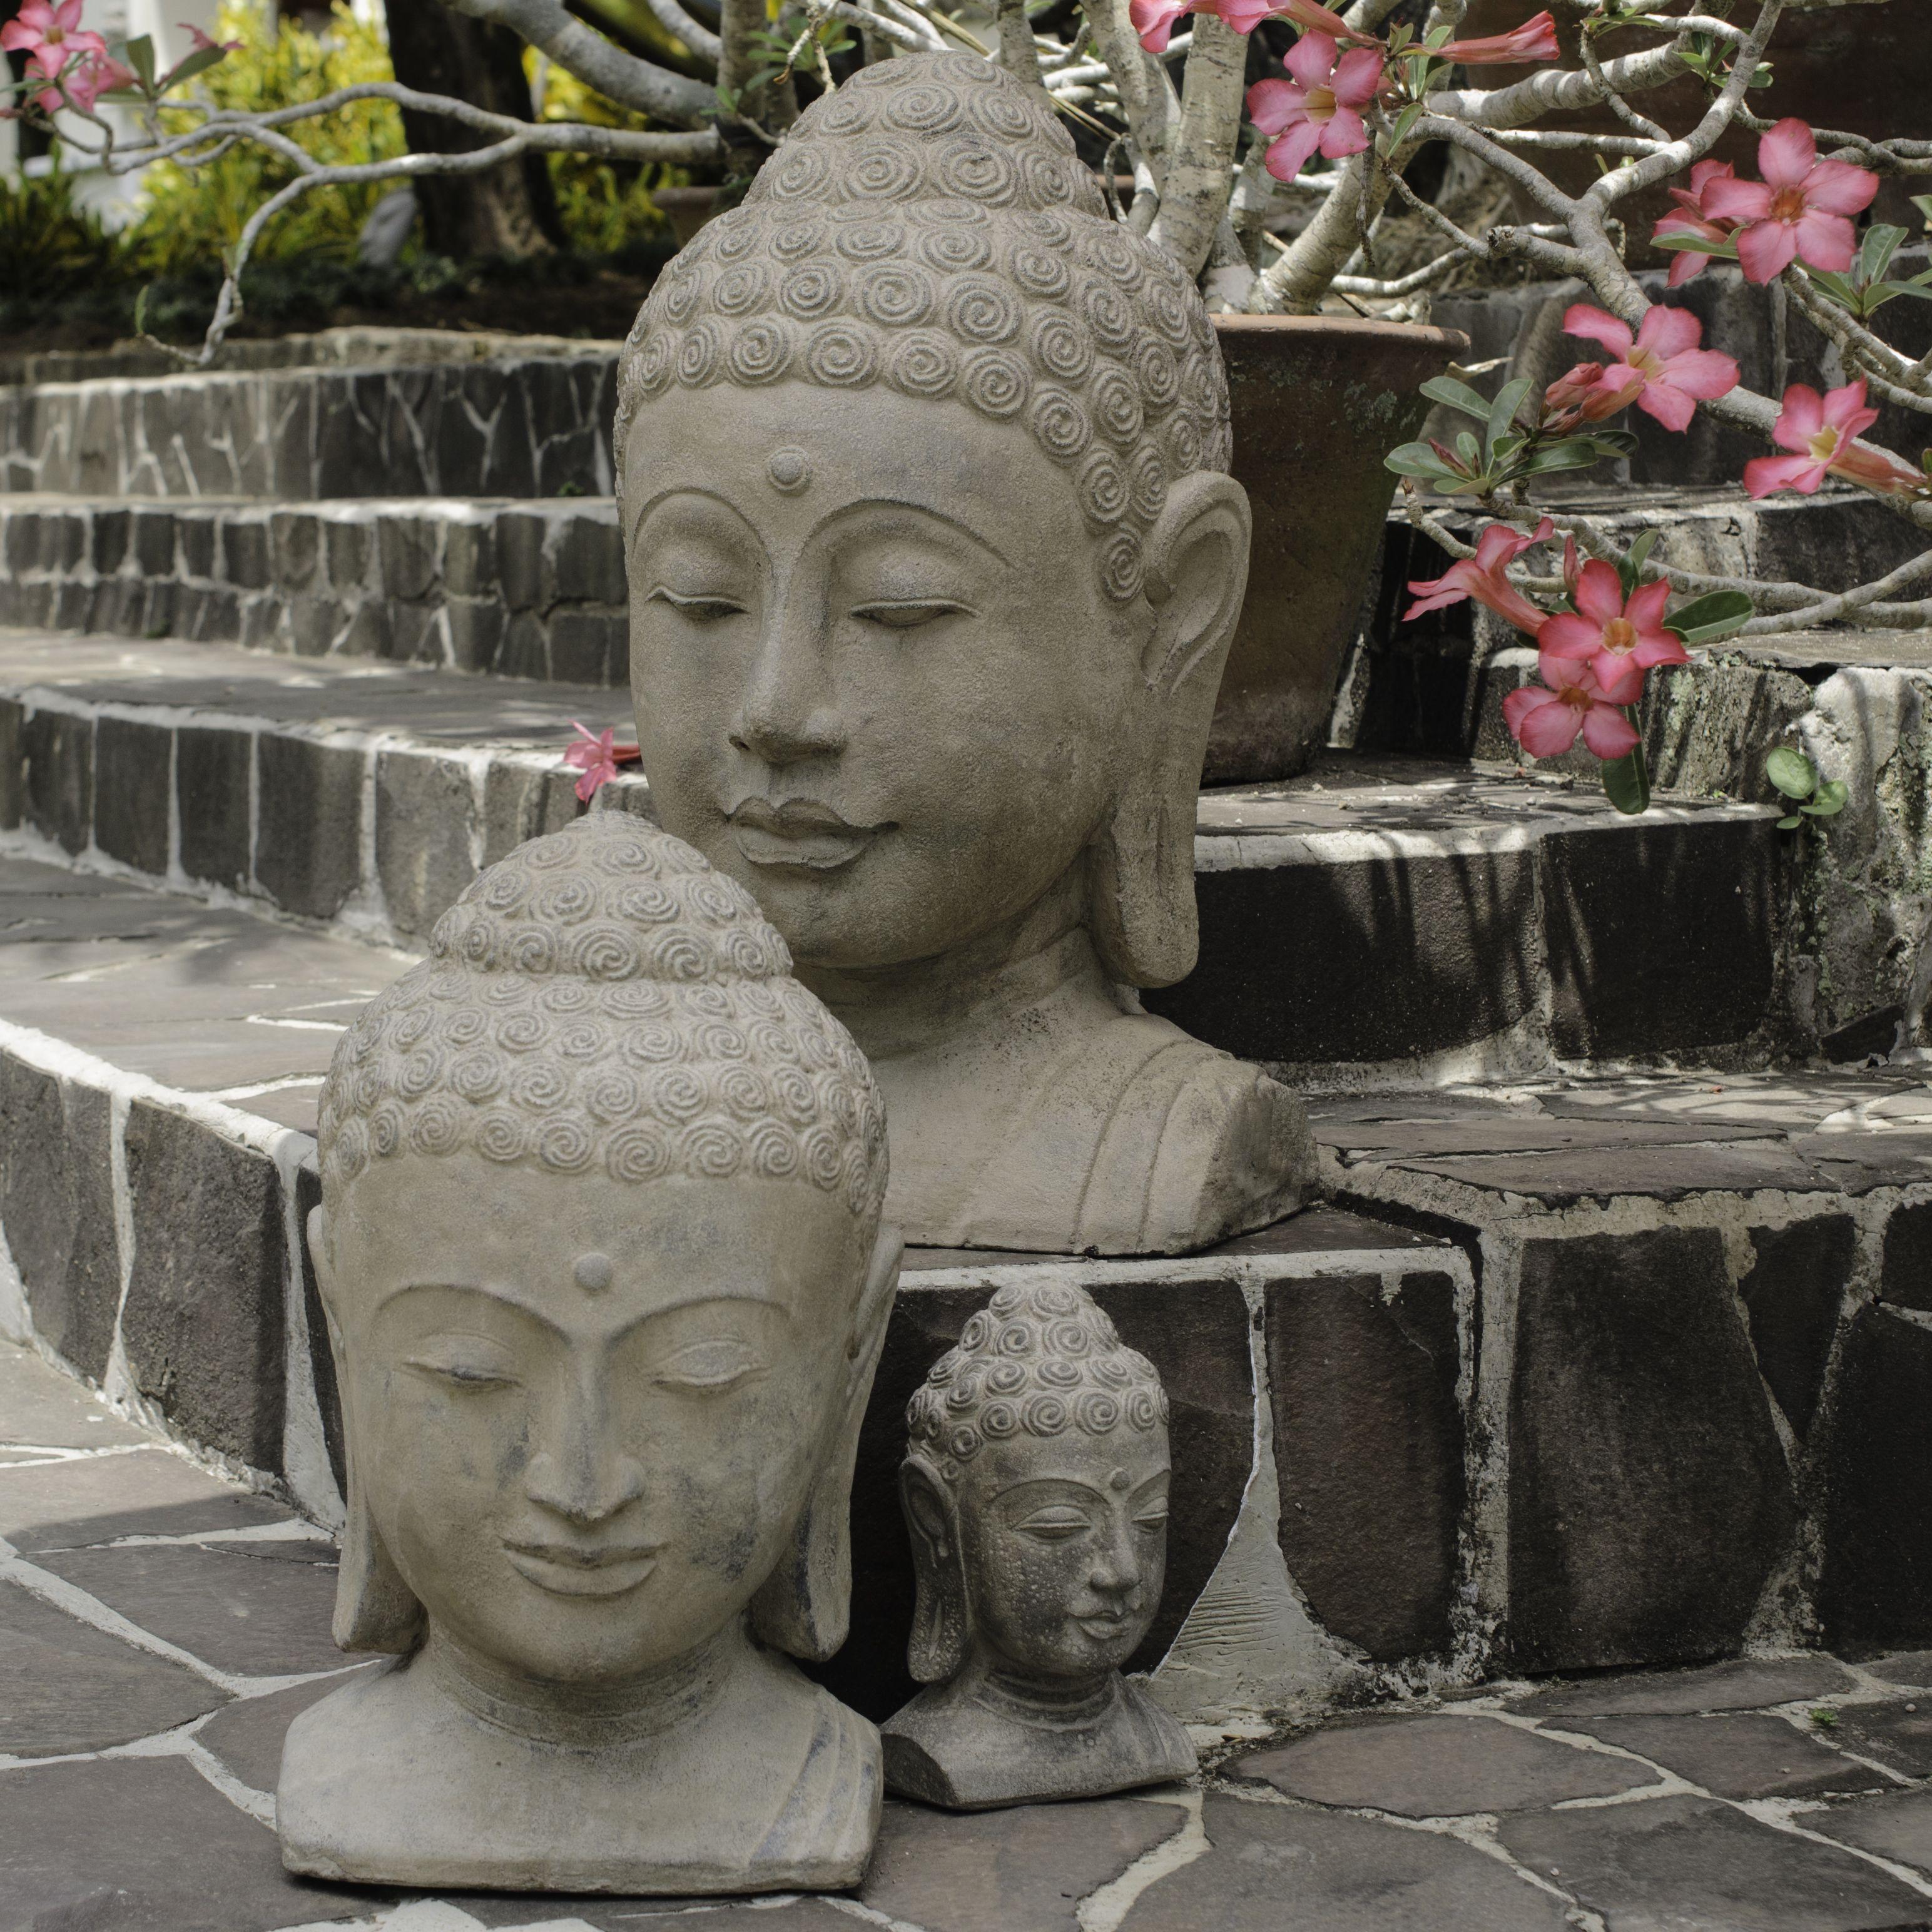 Handmade Volcanic Ash Sovereign Buddha Statue (Indonesia)